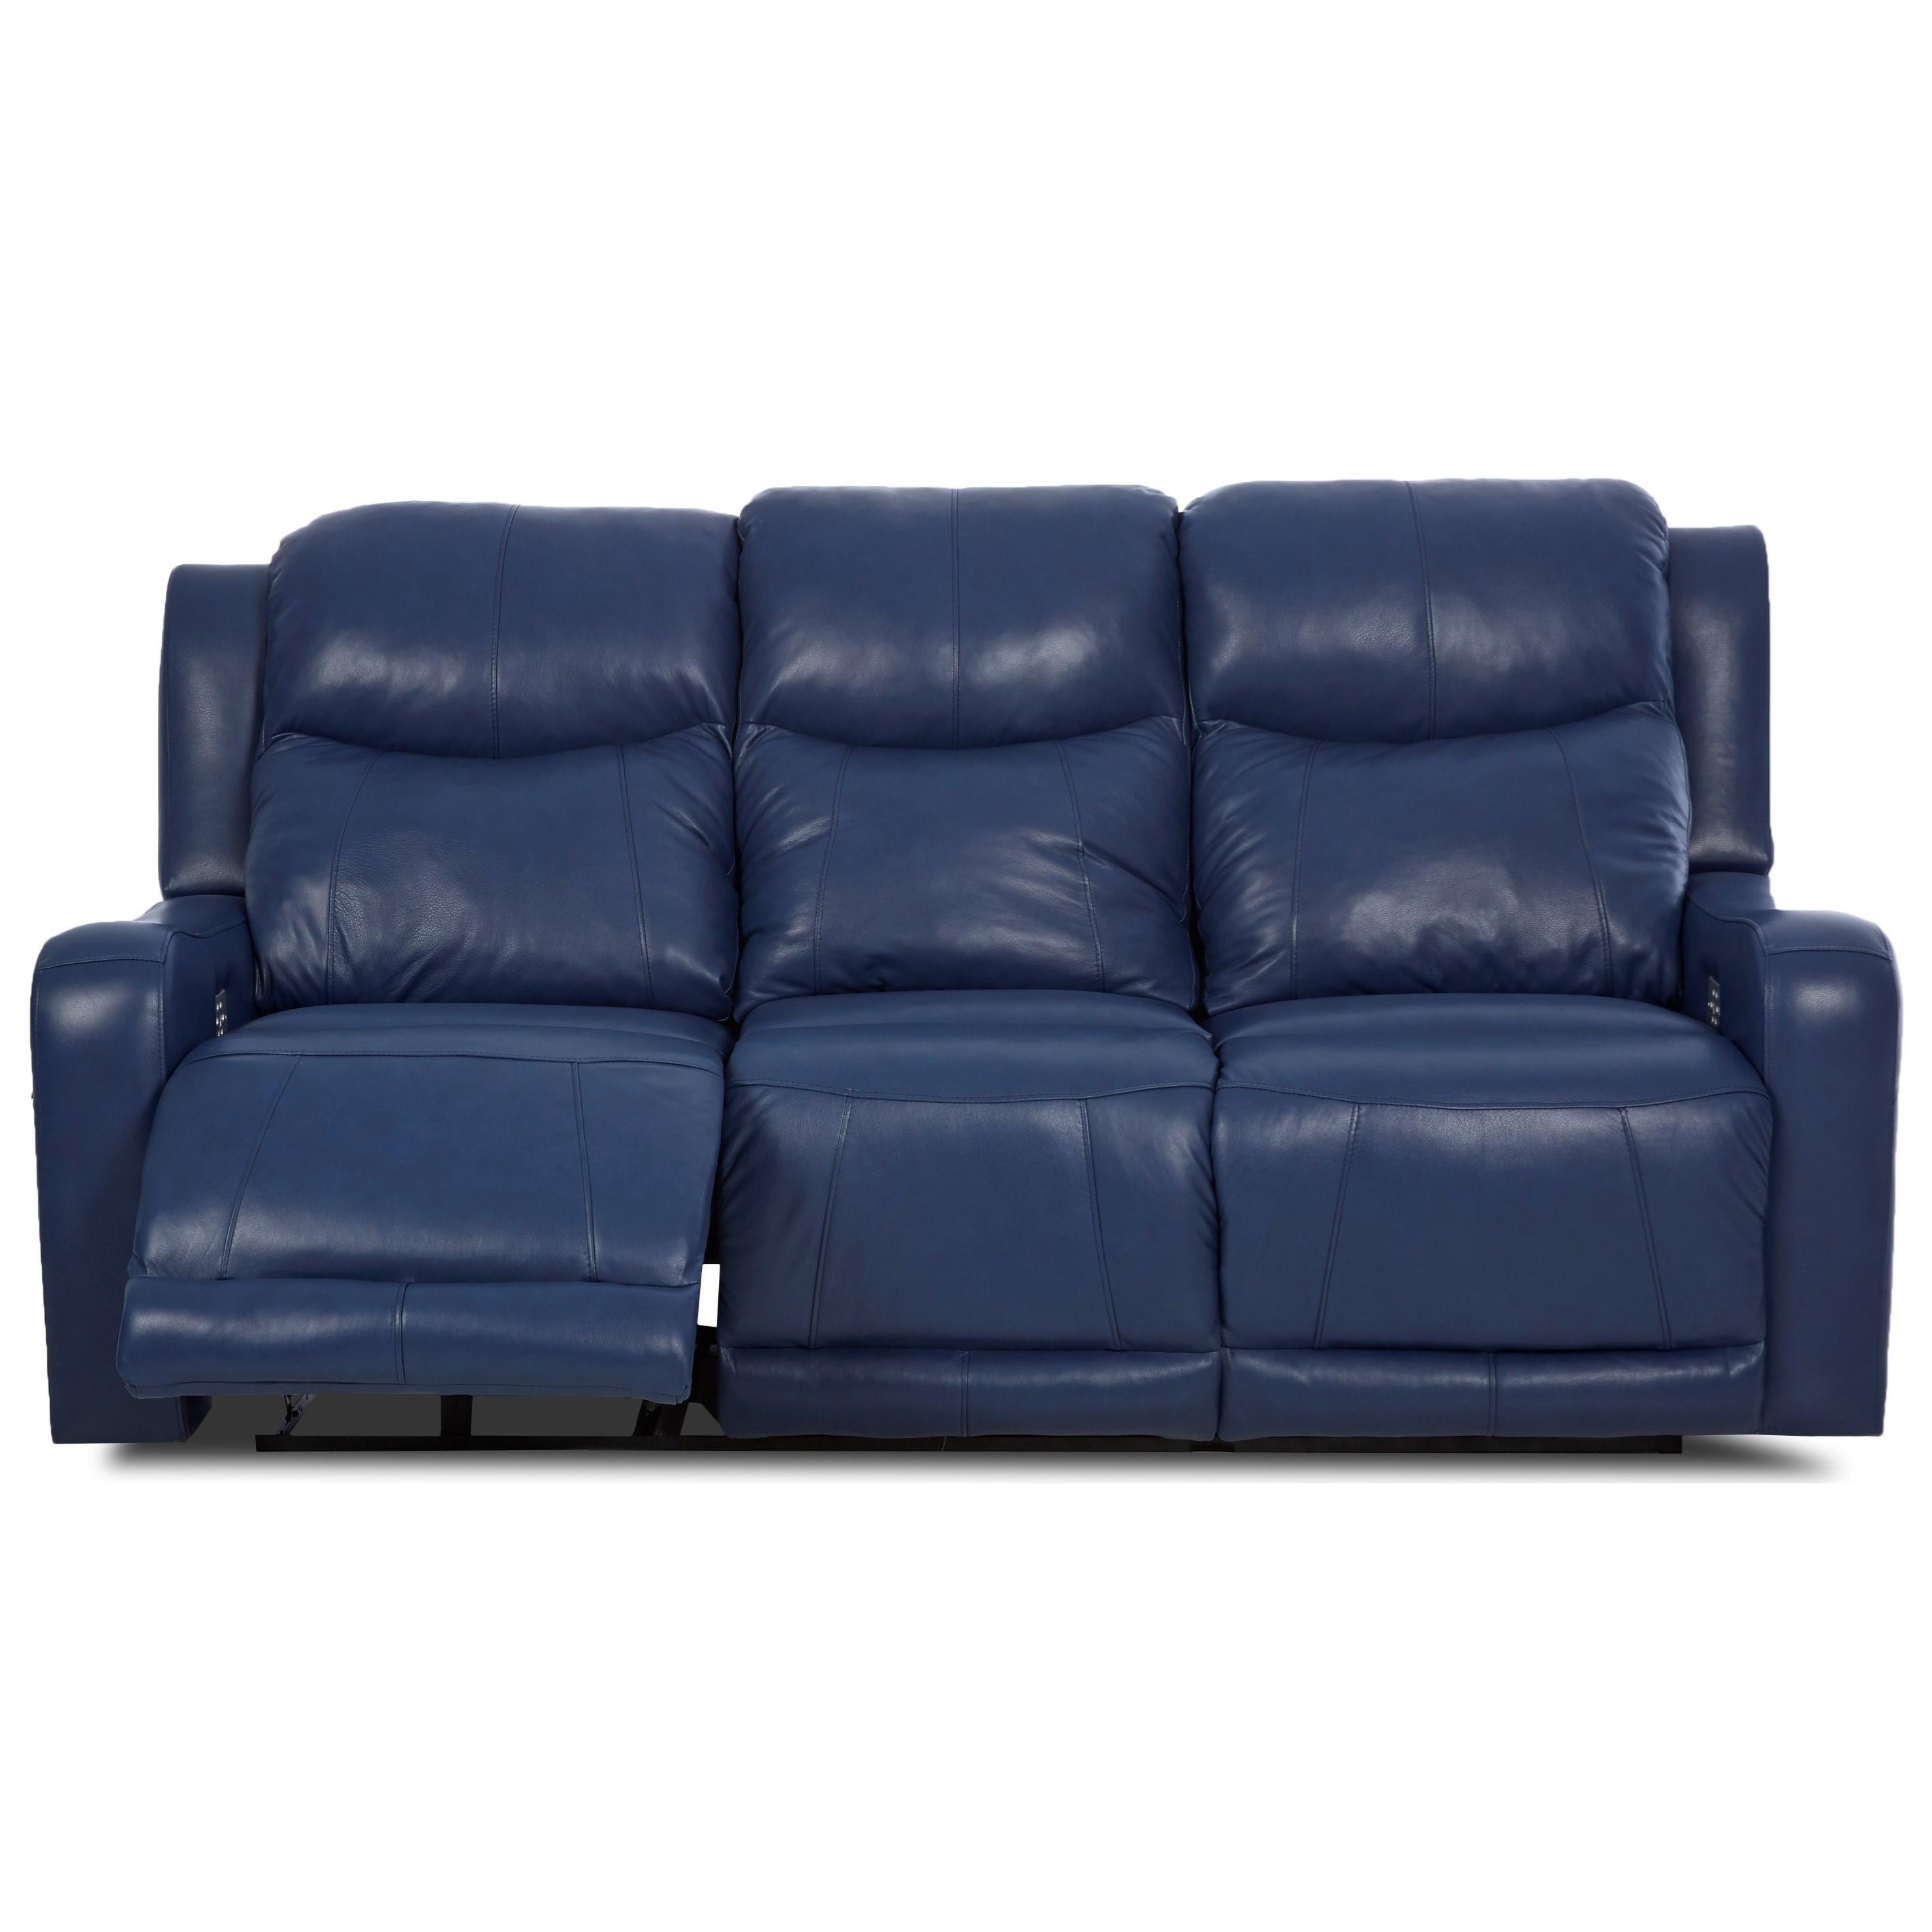 klaussner grand power reclining sofa theatre seating sofas barnett with headrest